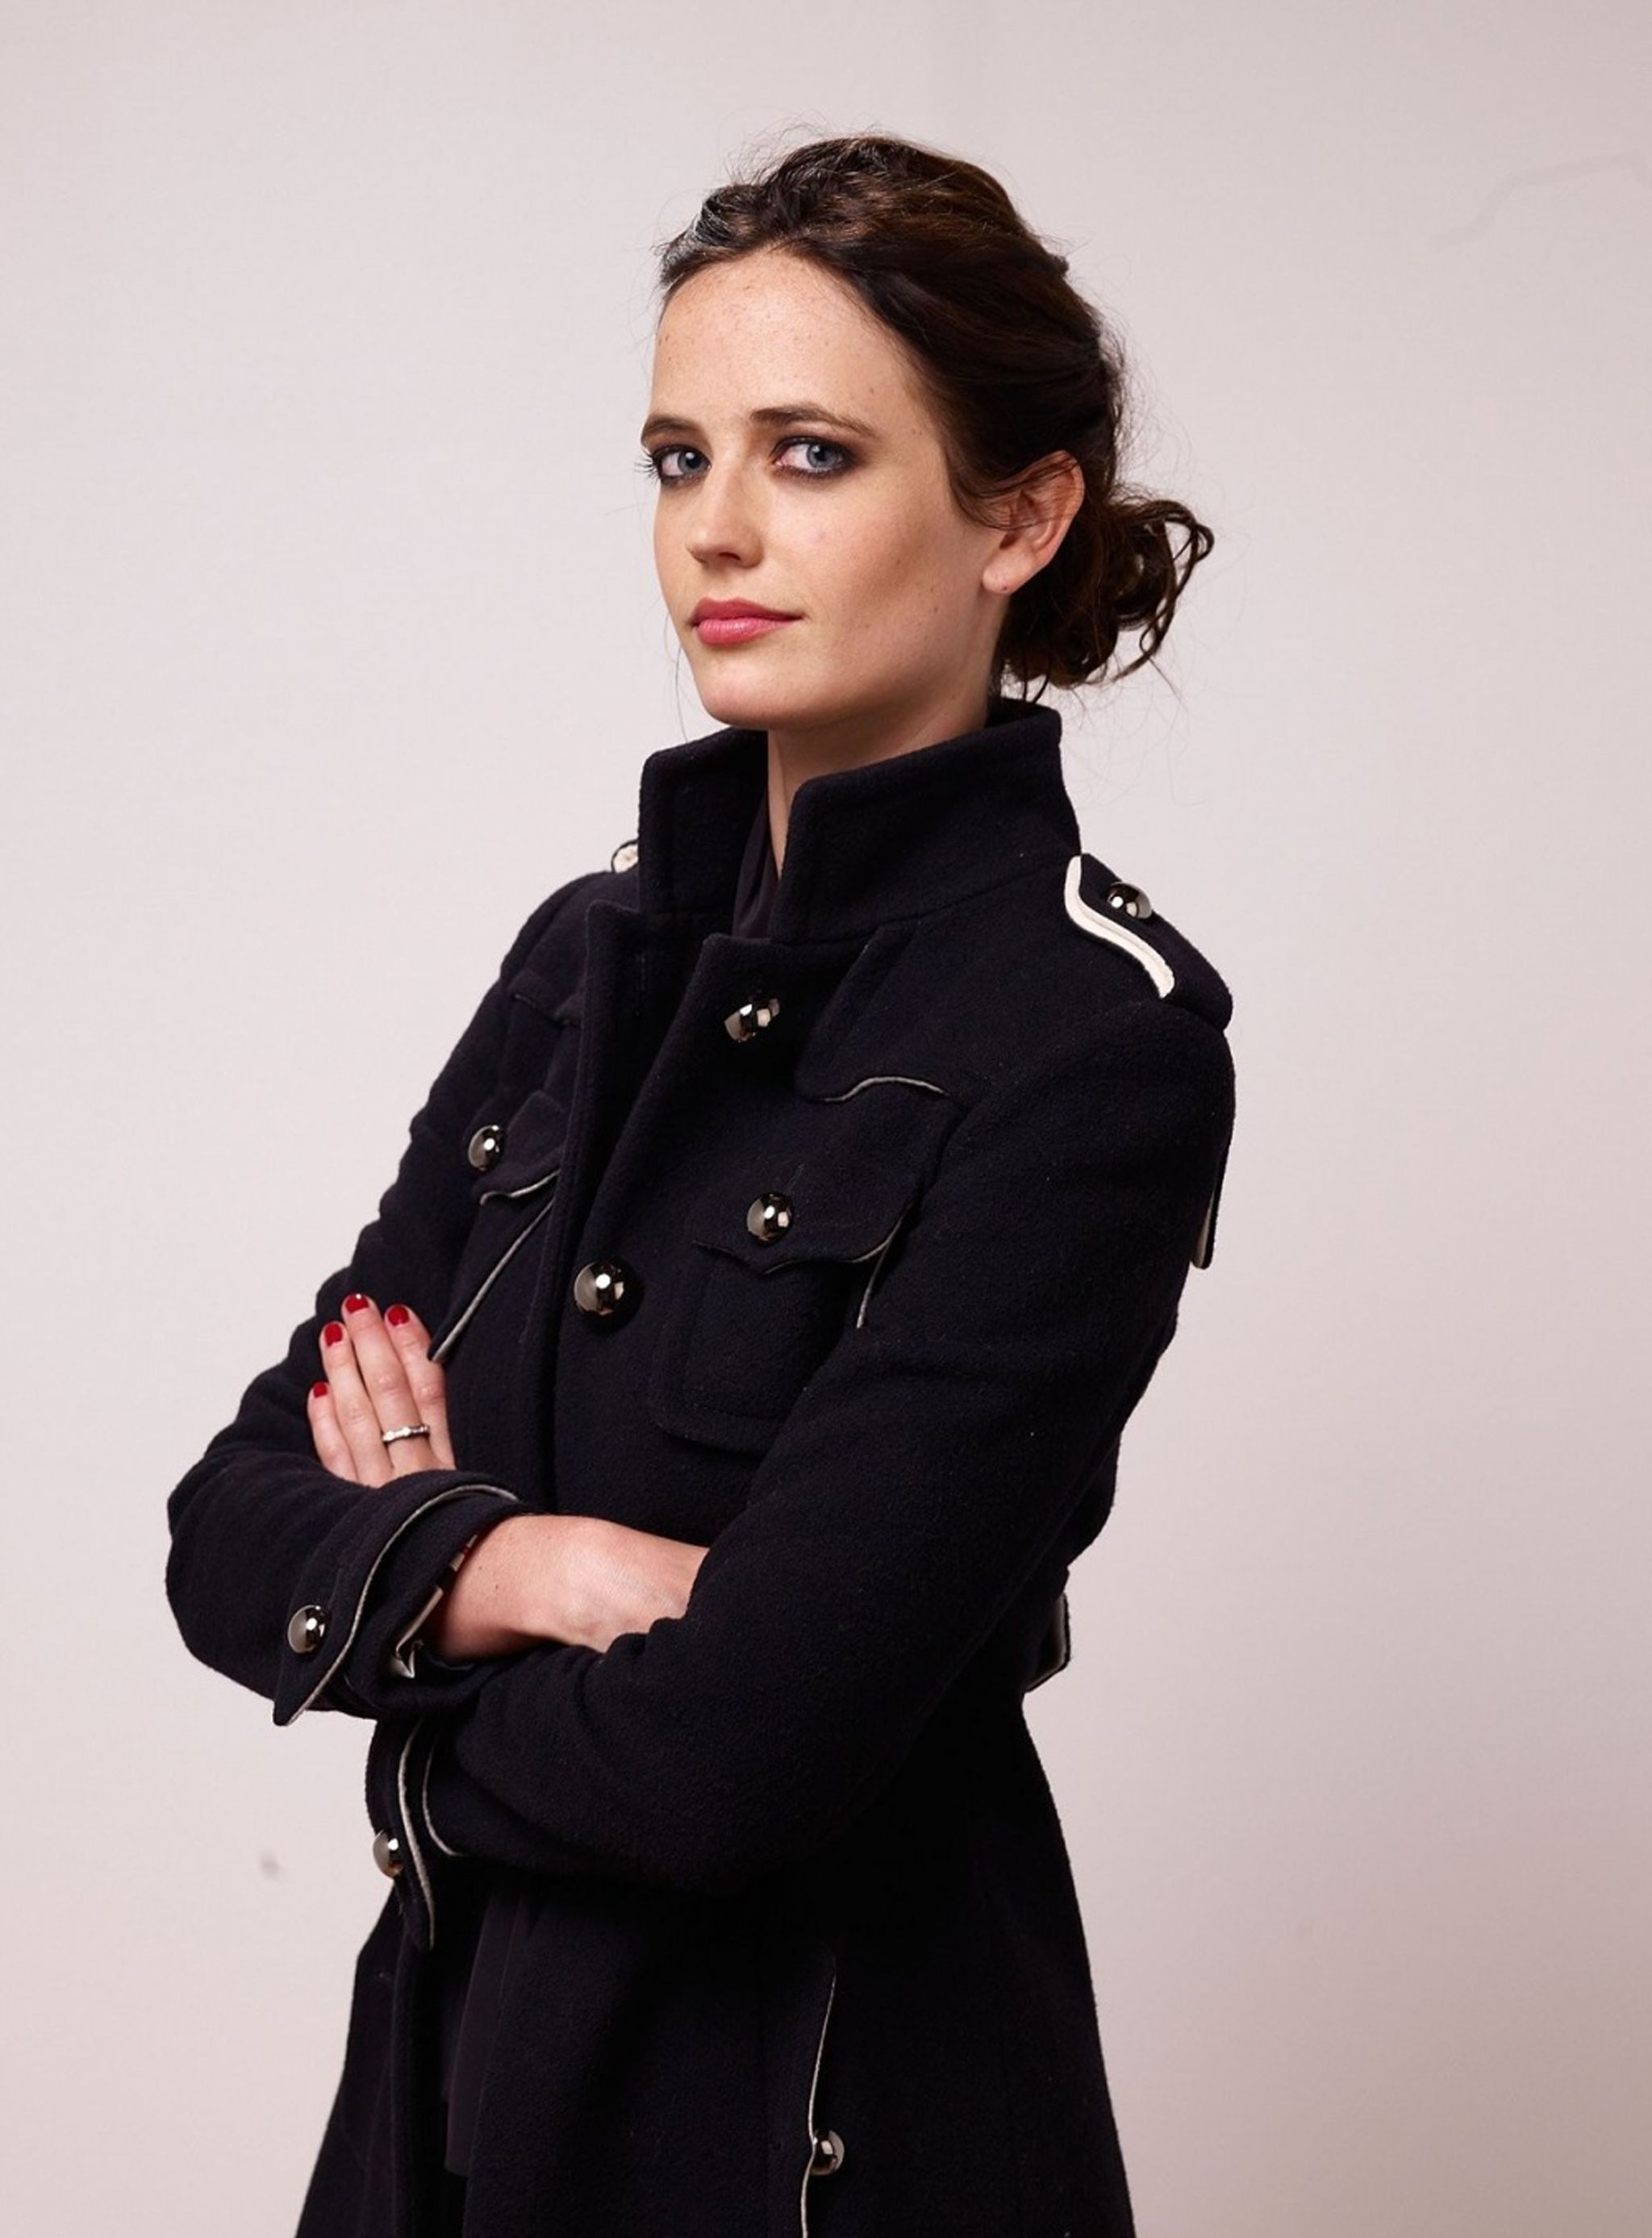 Image result for Eva green in uniform